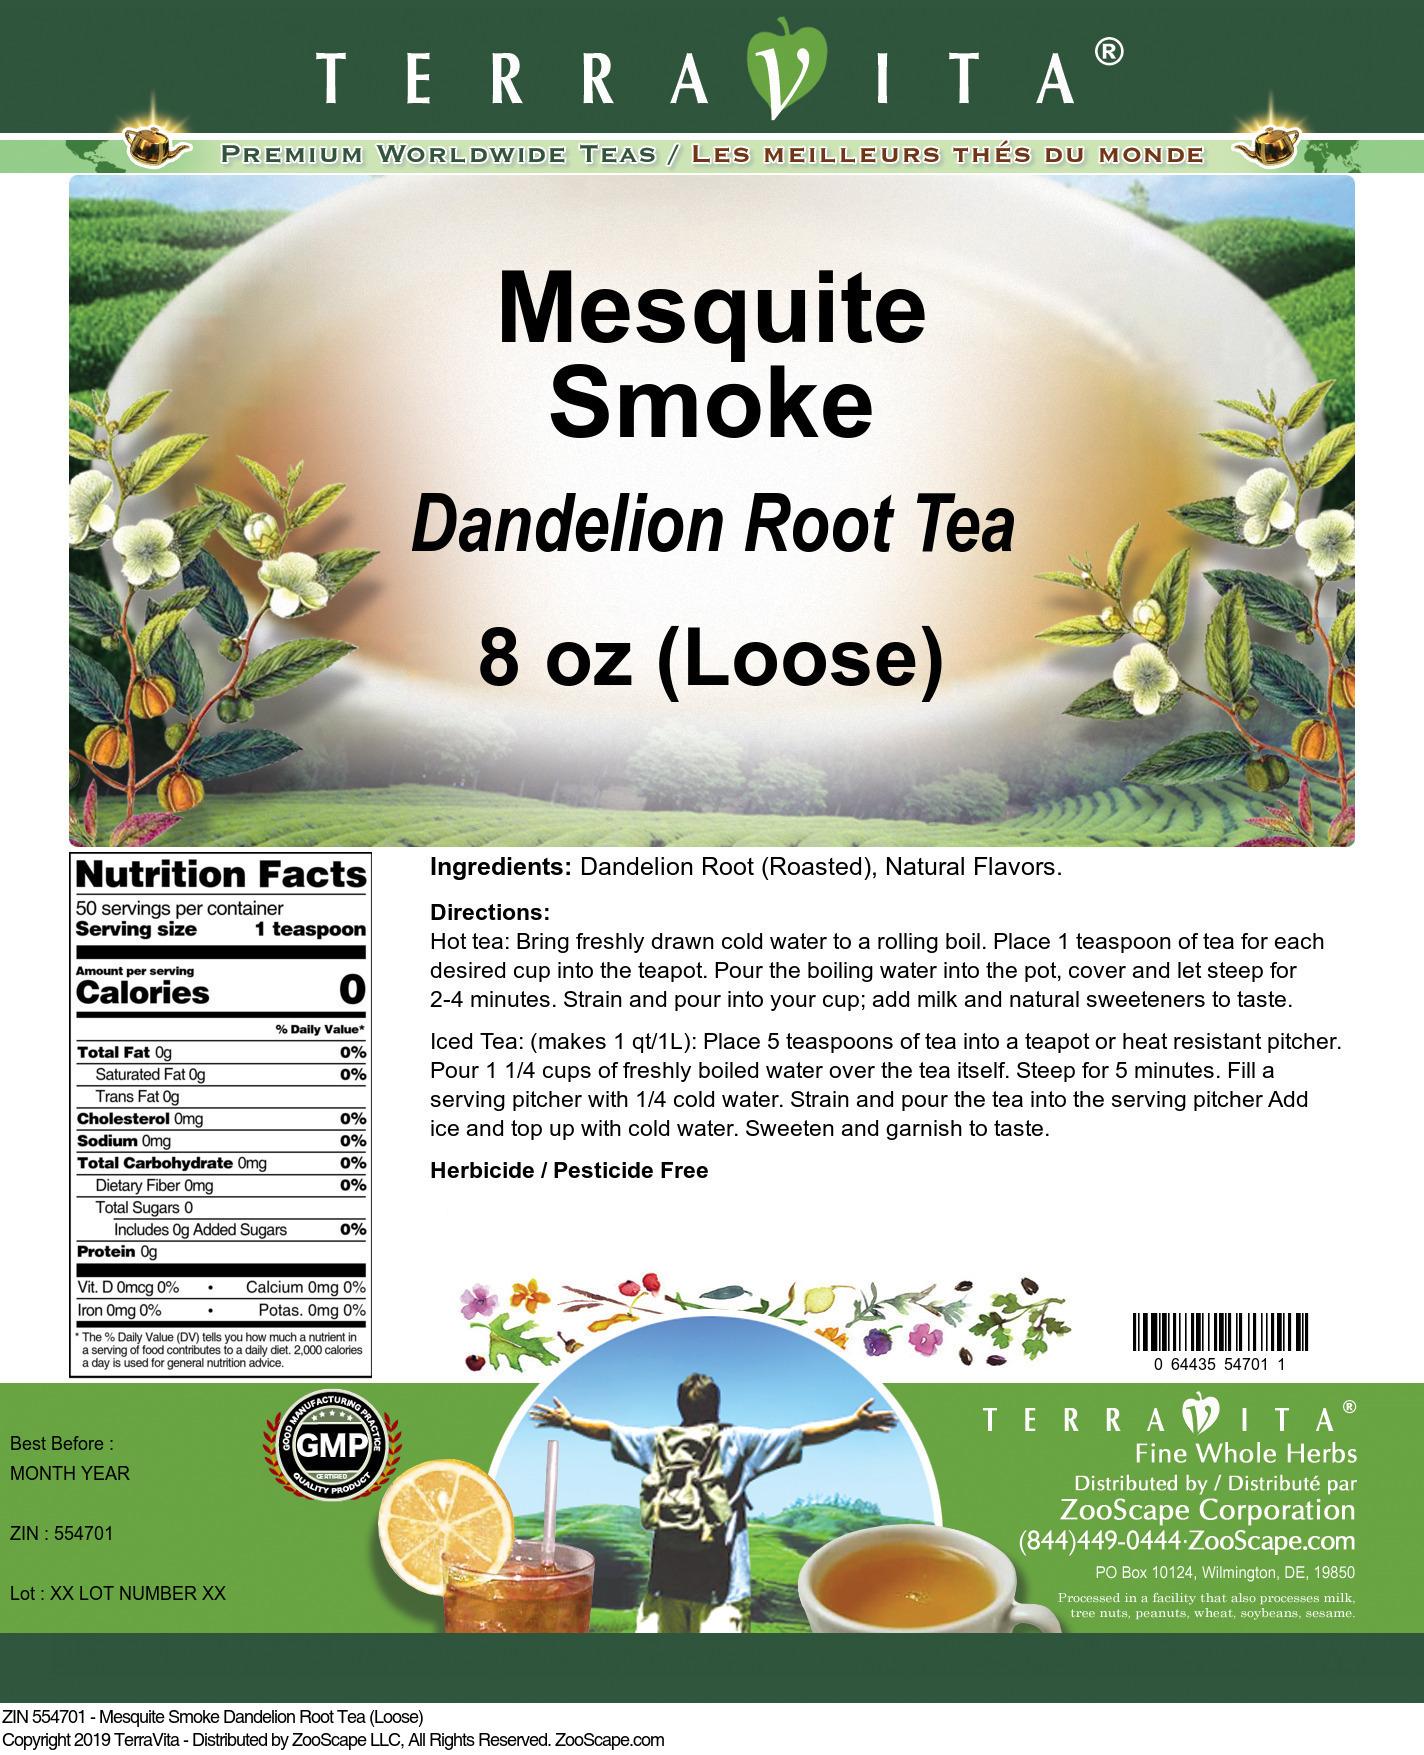 Mesquite Smoke Dandelion Root Tea (Loose)